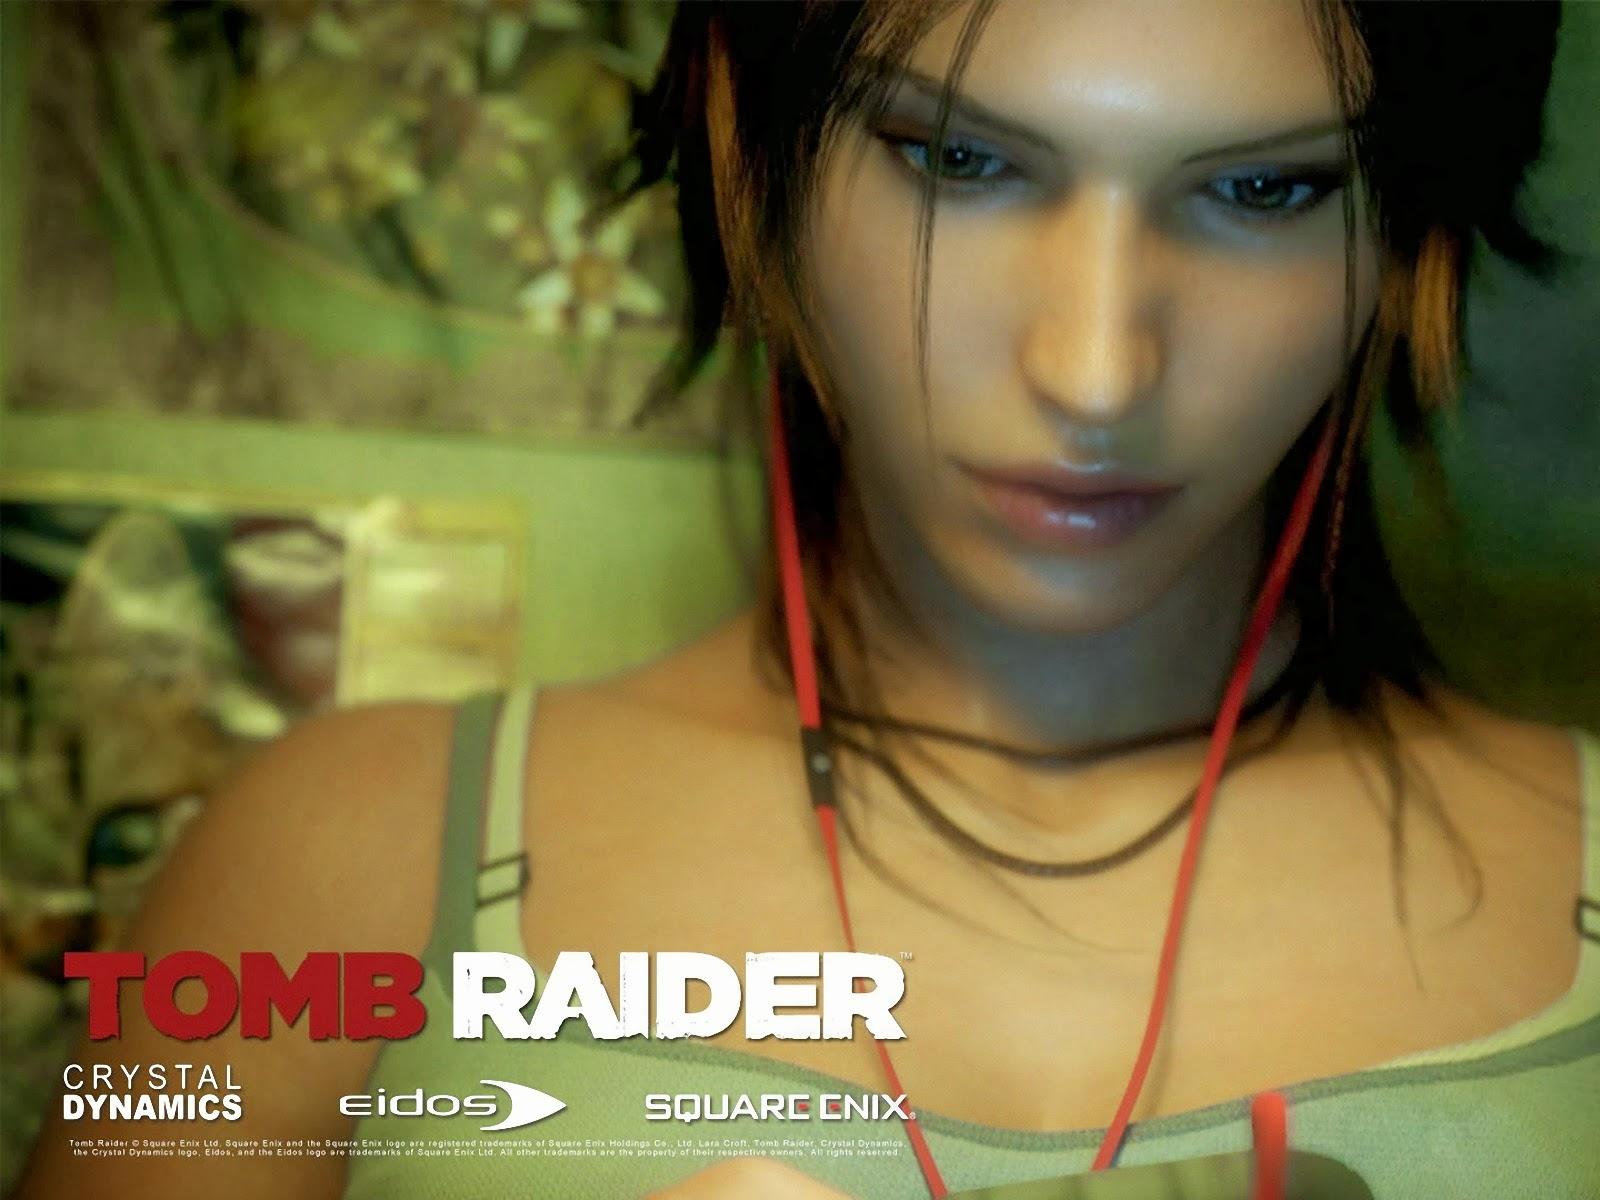 Download free tomb raider anniversary bdms sex mod in pc